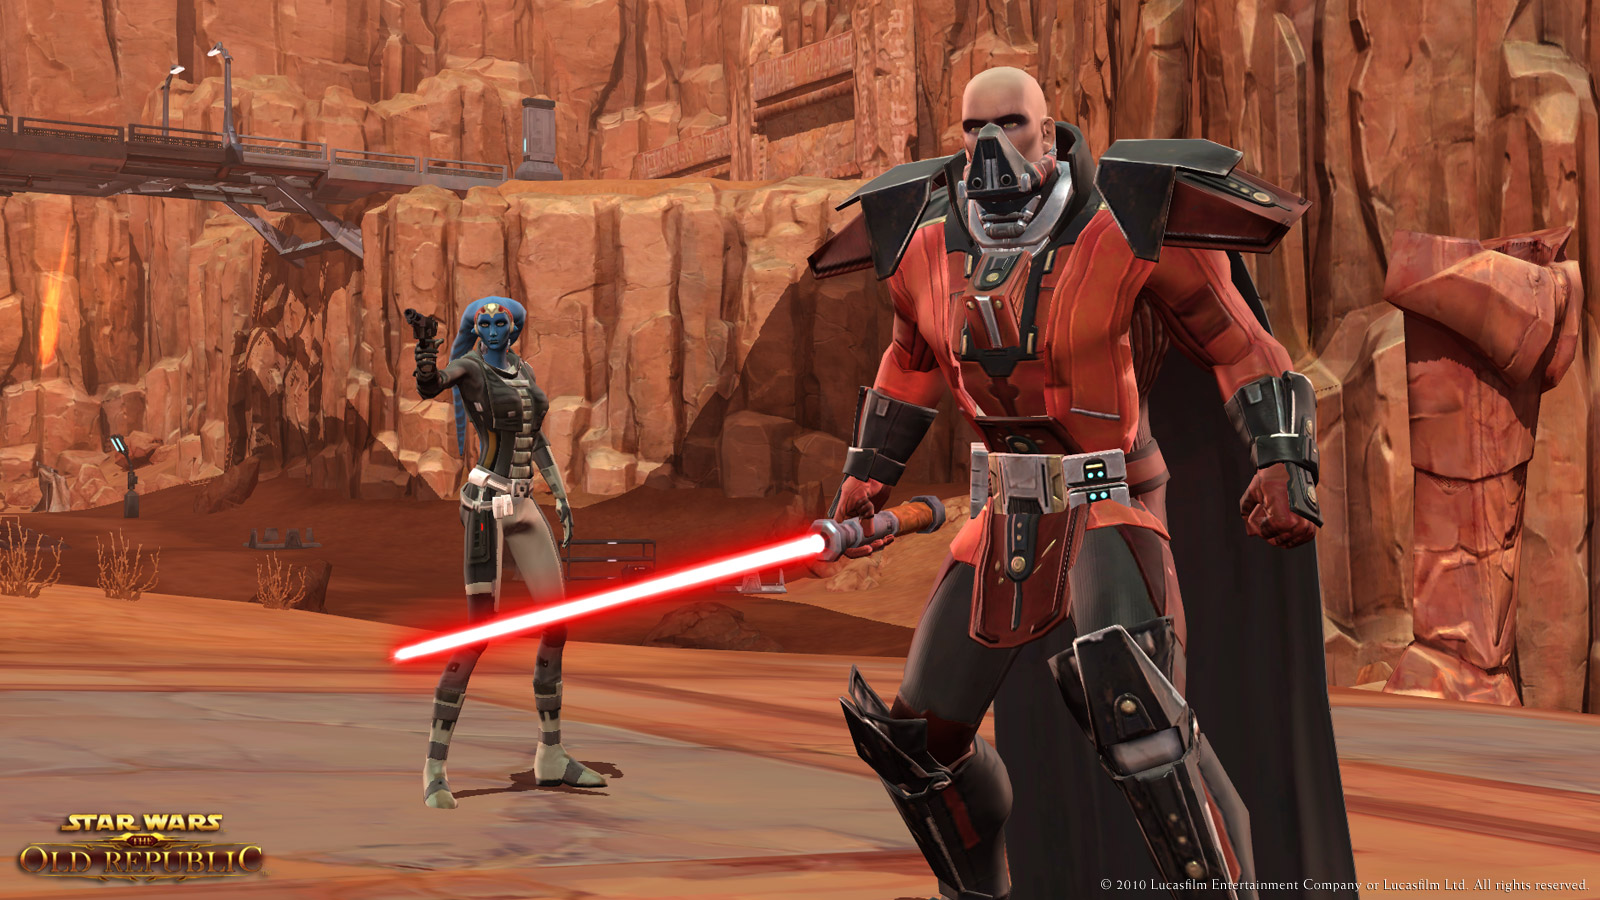 Star Wars the Old Republic Sith screenshot